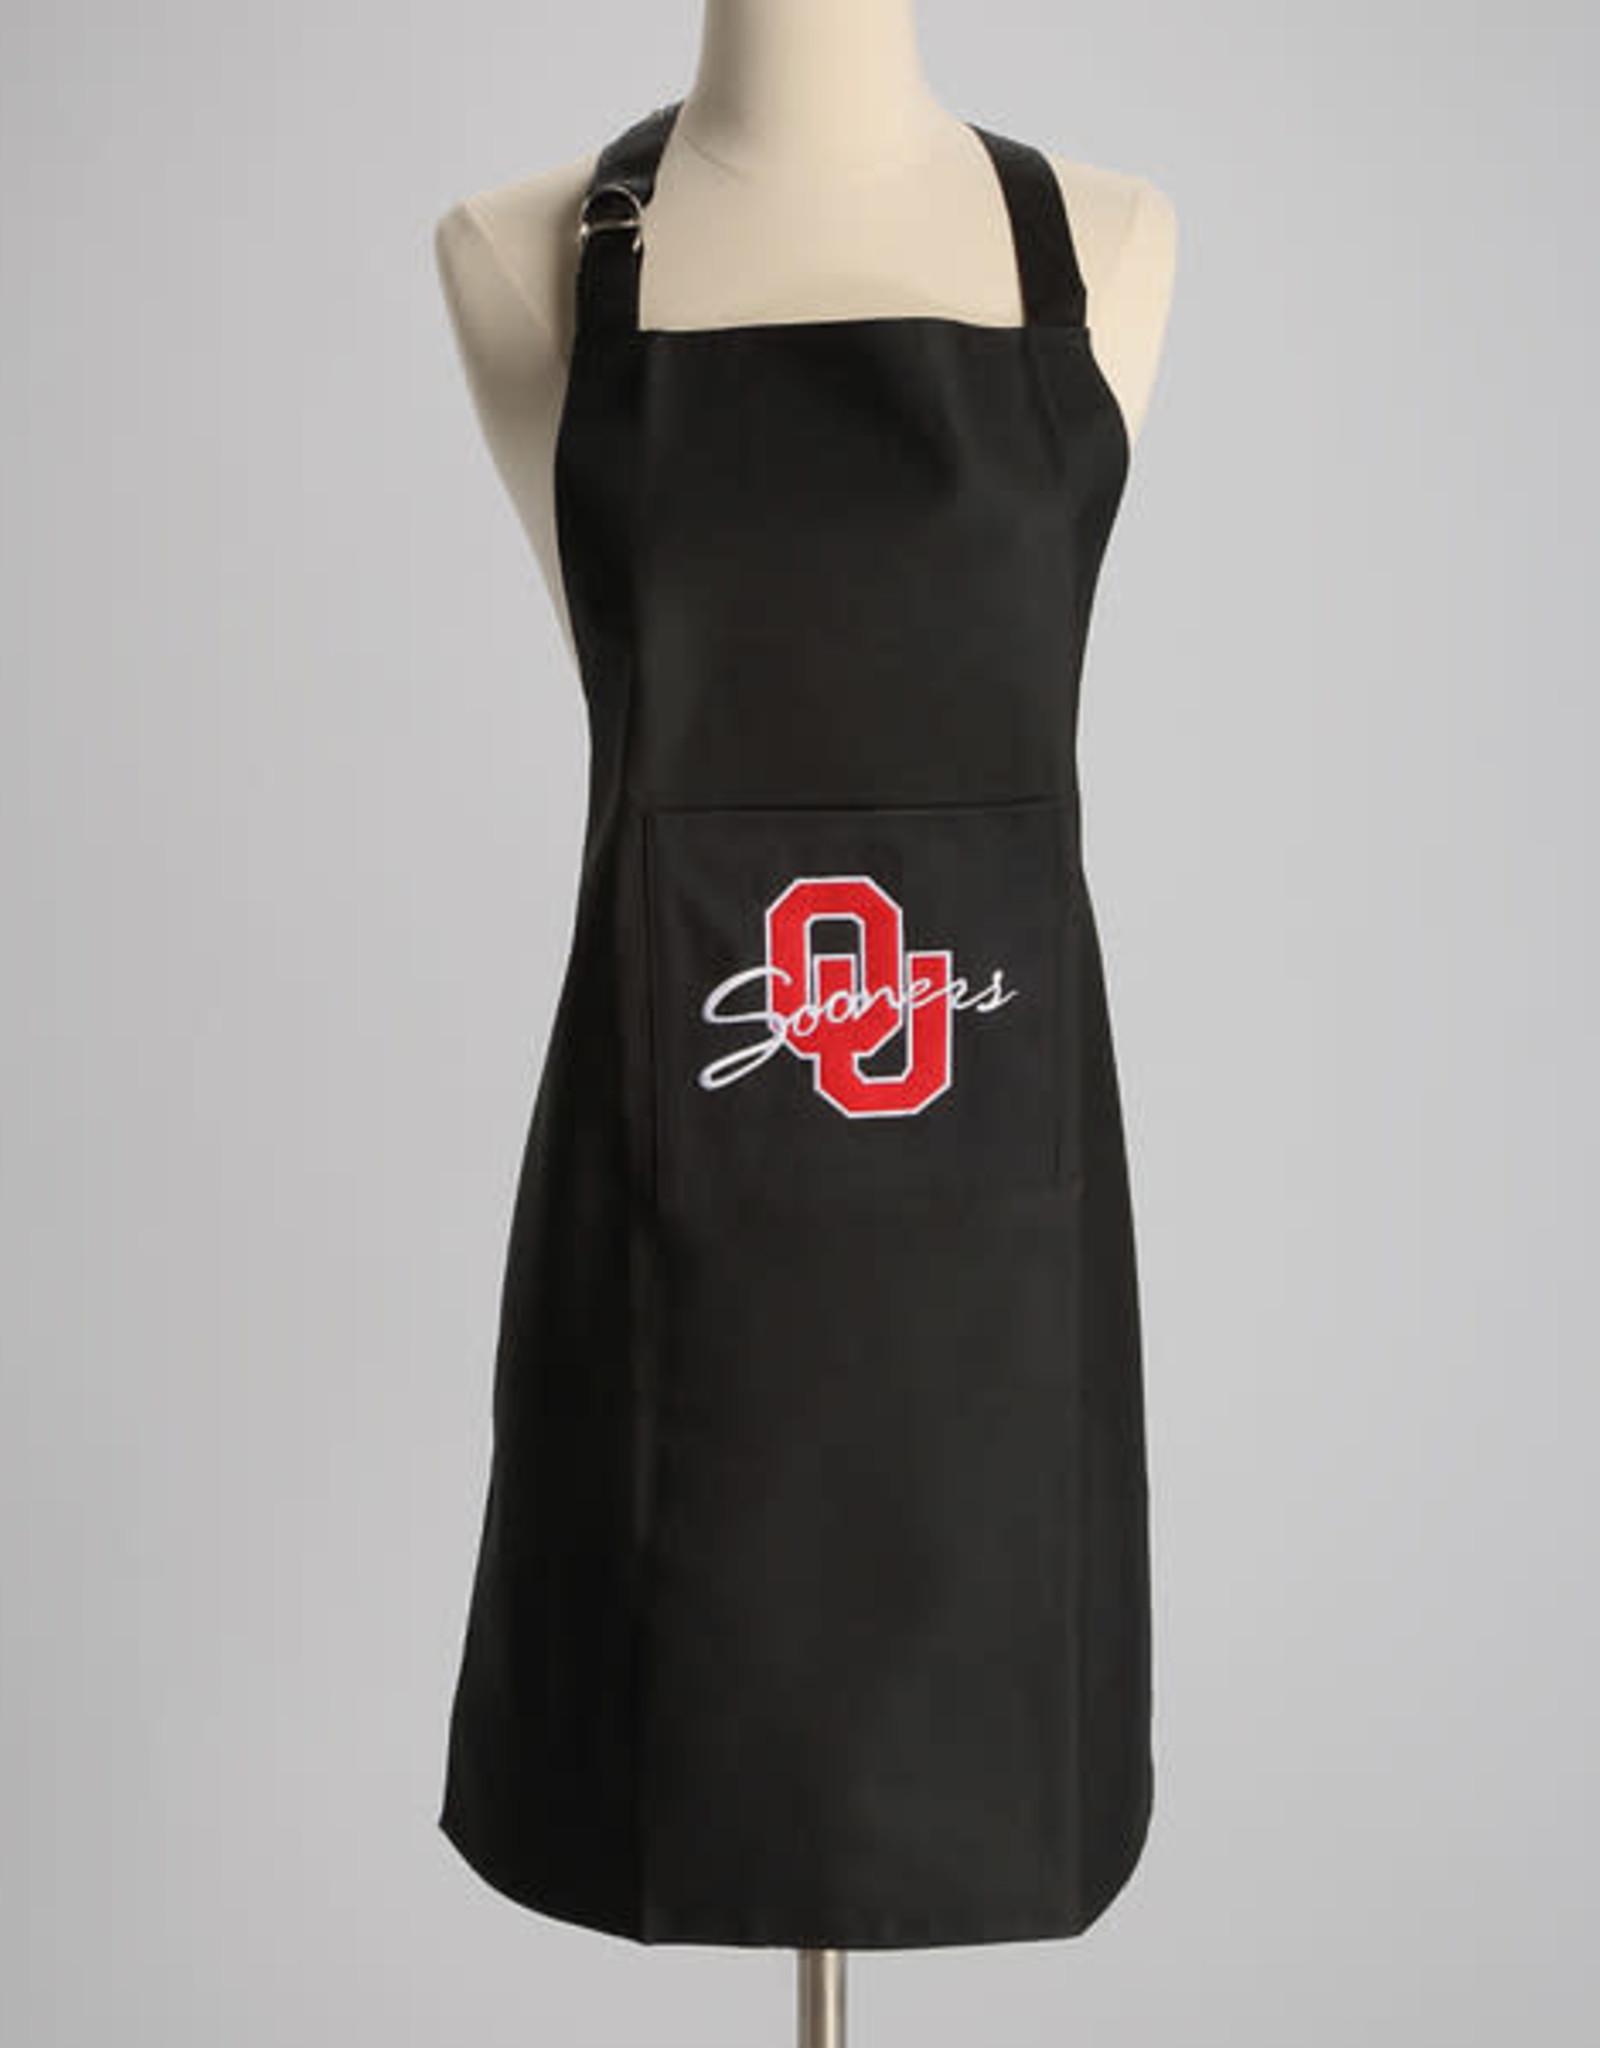 Jenkins Embroidered Black OU Sooners Apron